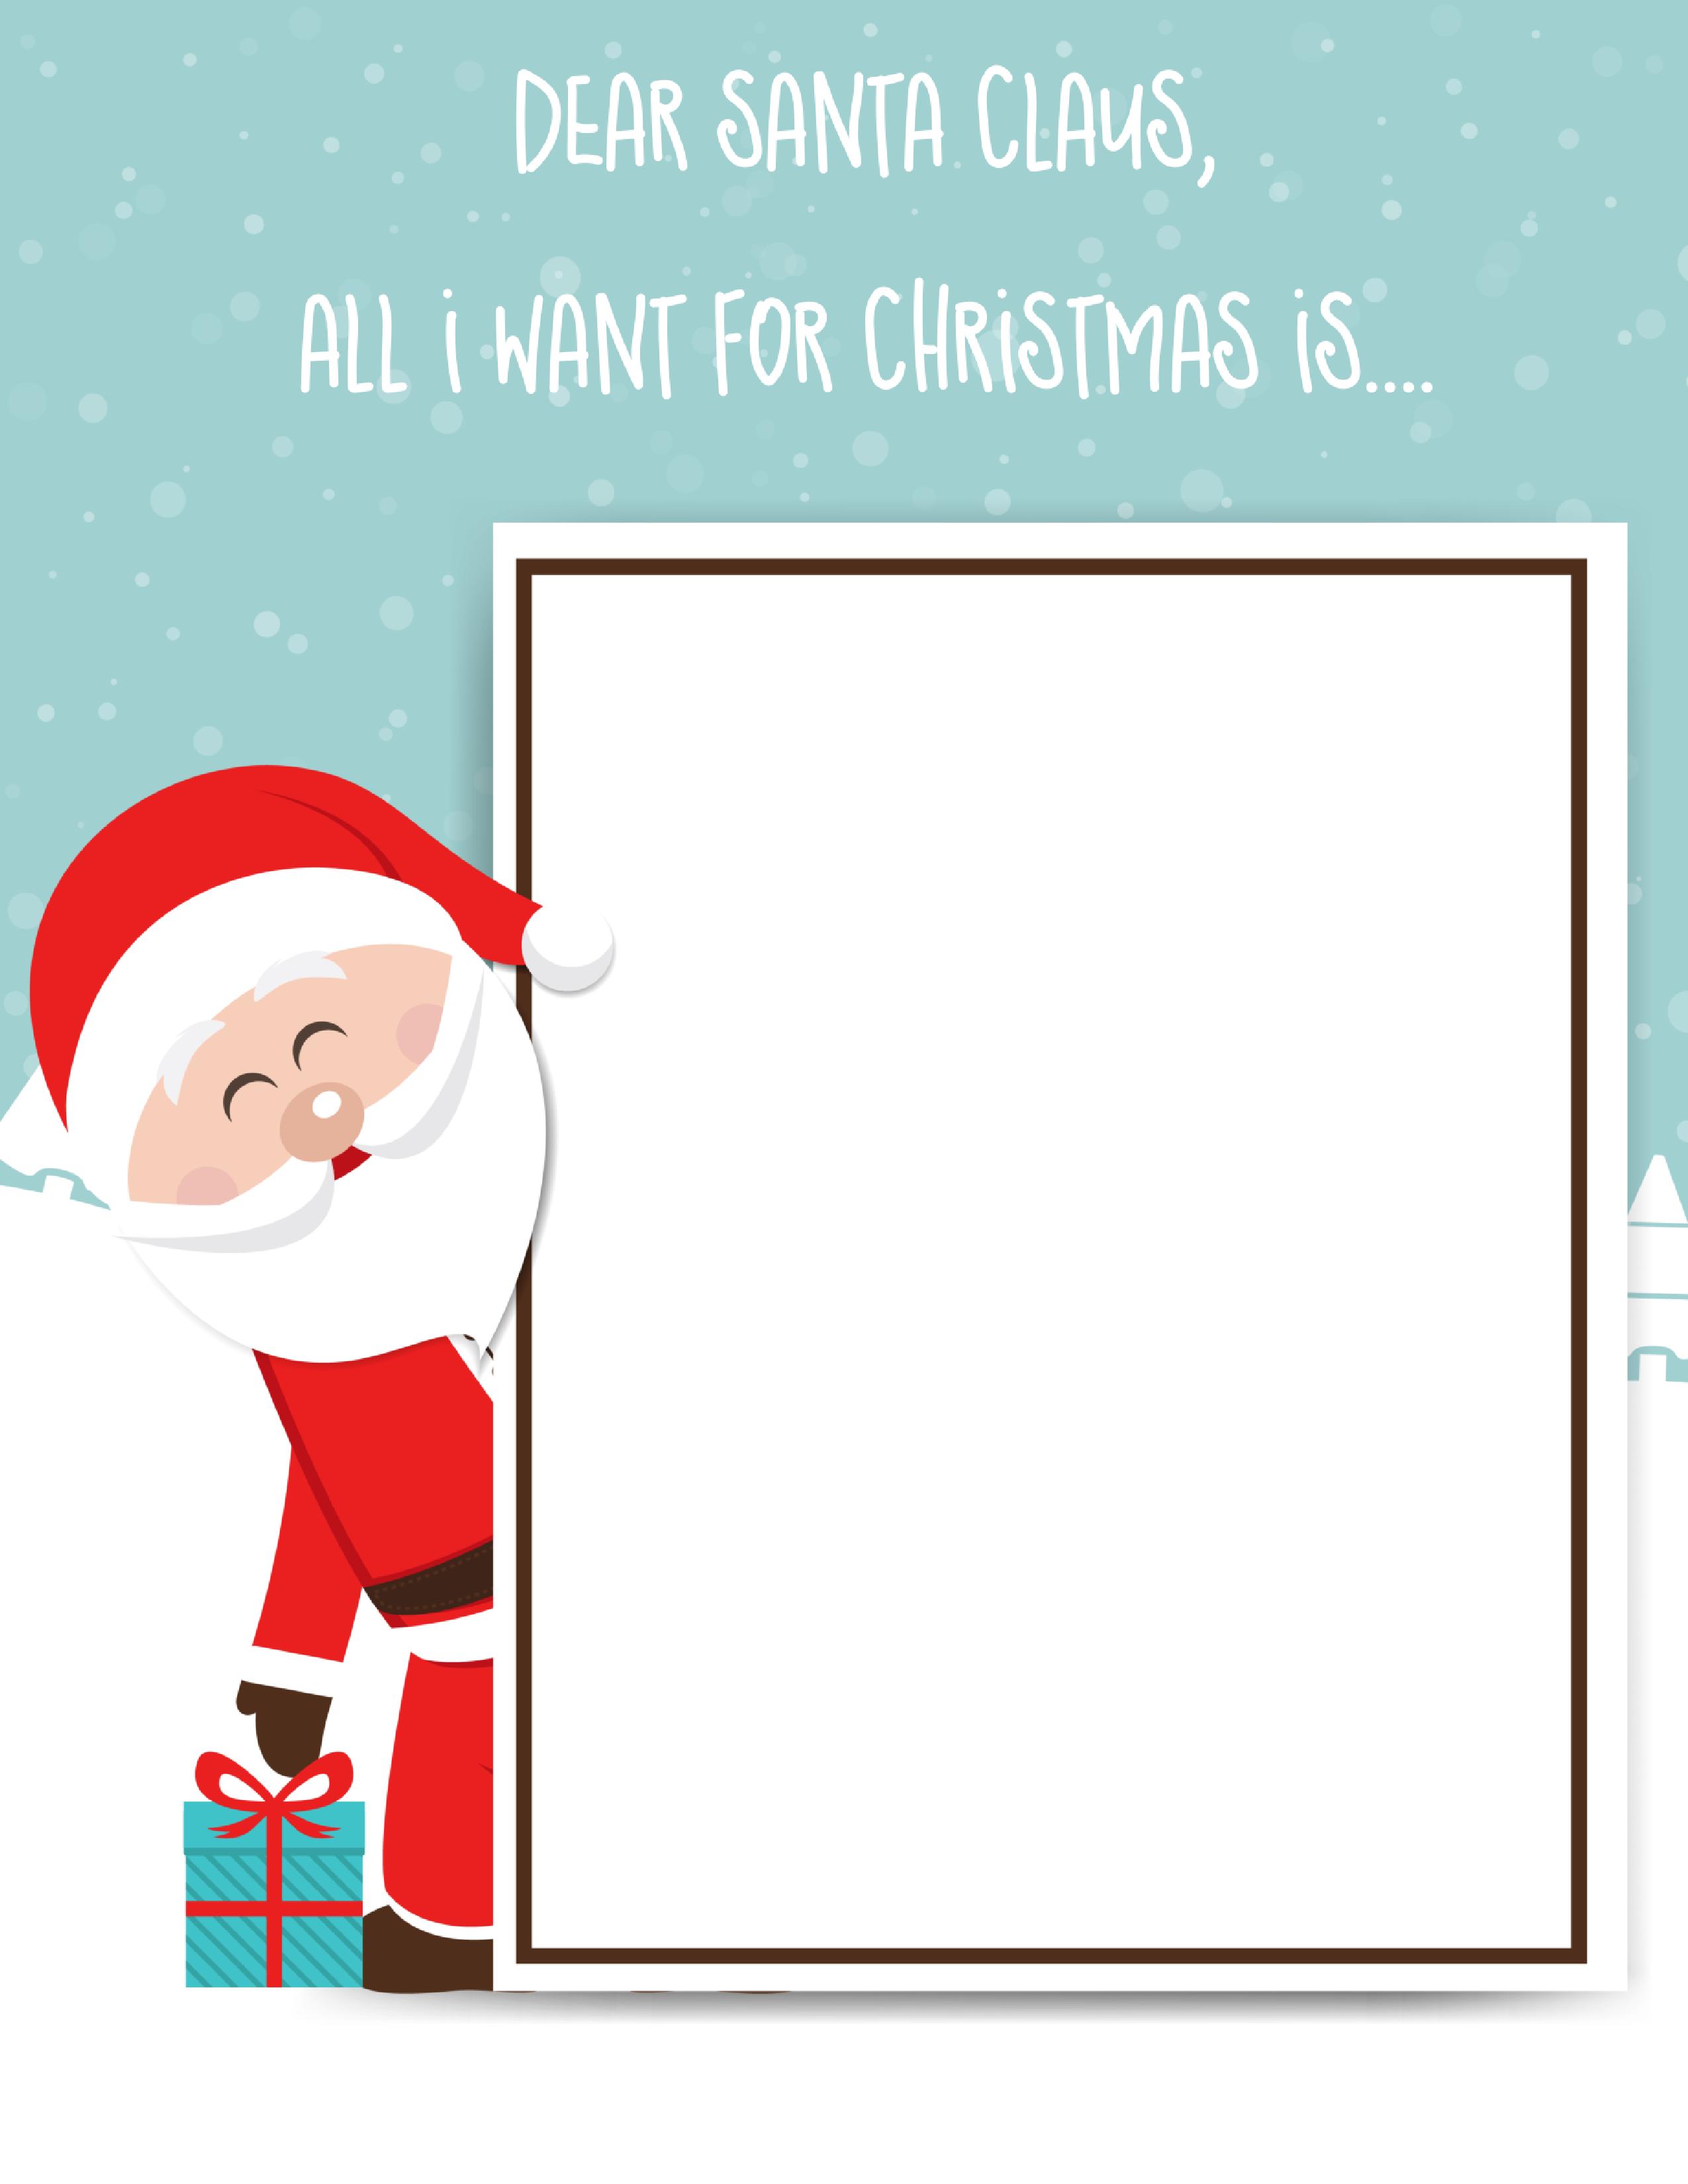 Santa Claus Letter: Free Printable For Kids - - Free Printable Letters From Santa Claus